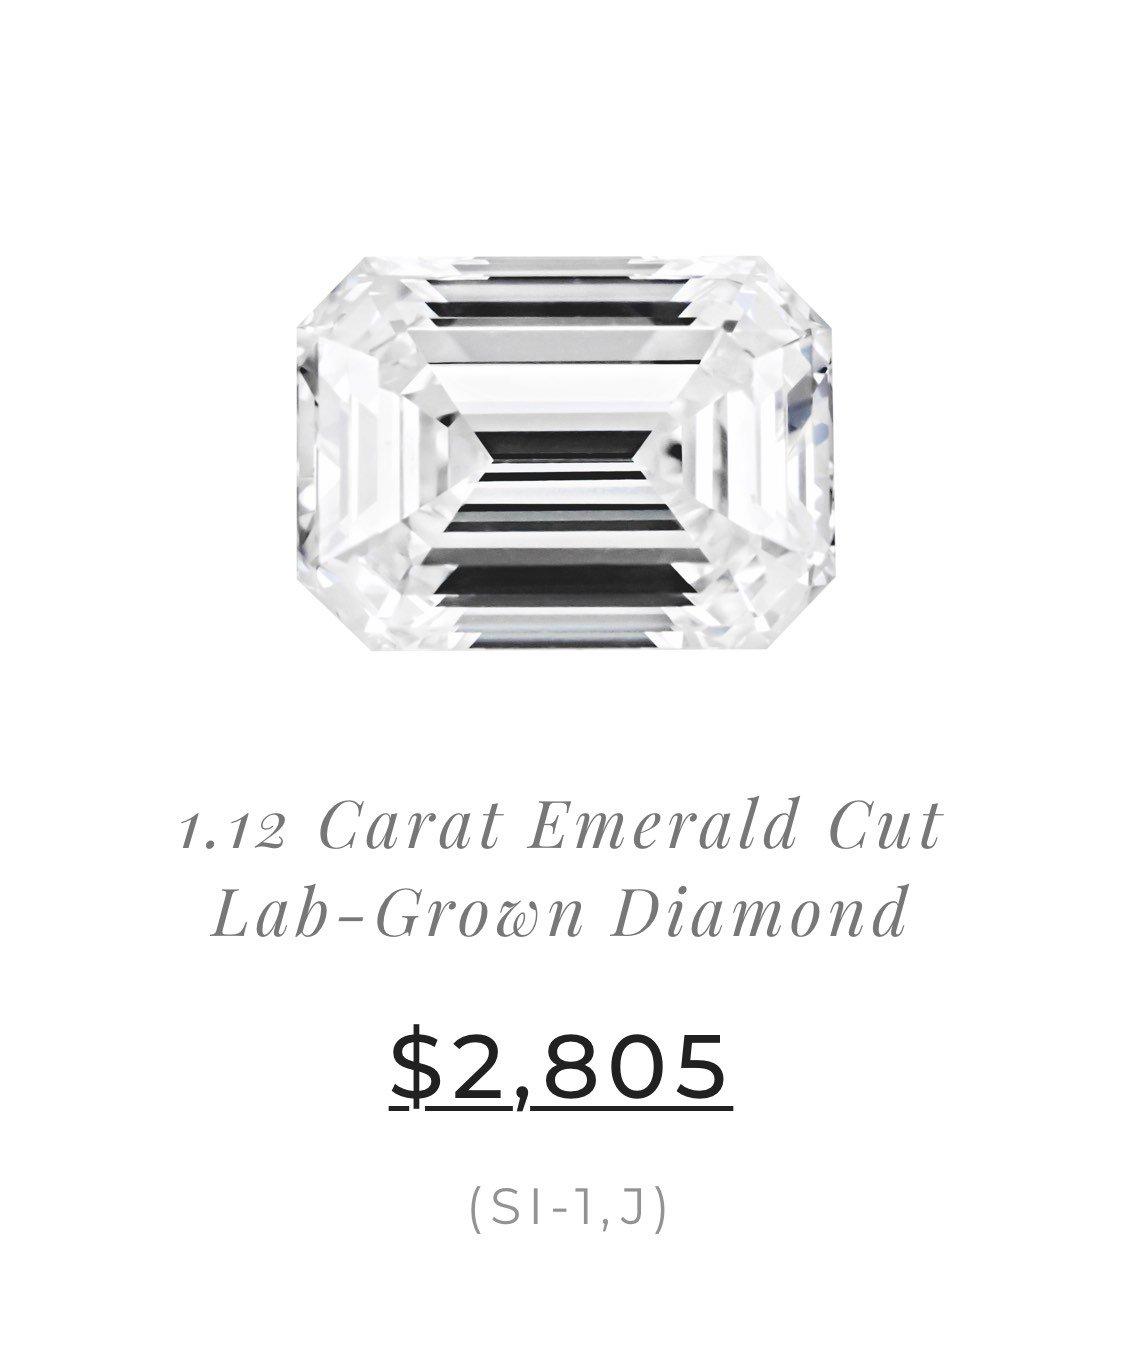 1.12 Carat Emerald Cut Lab-Grown Diamond